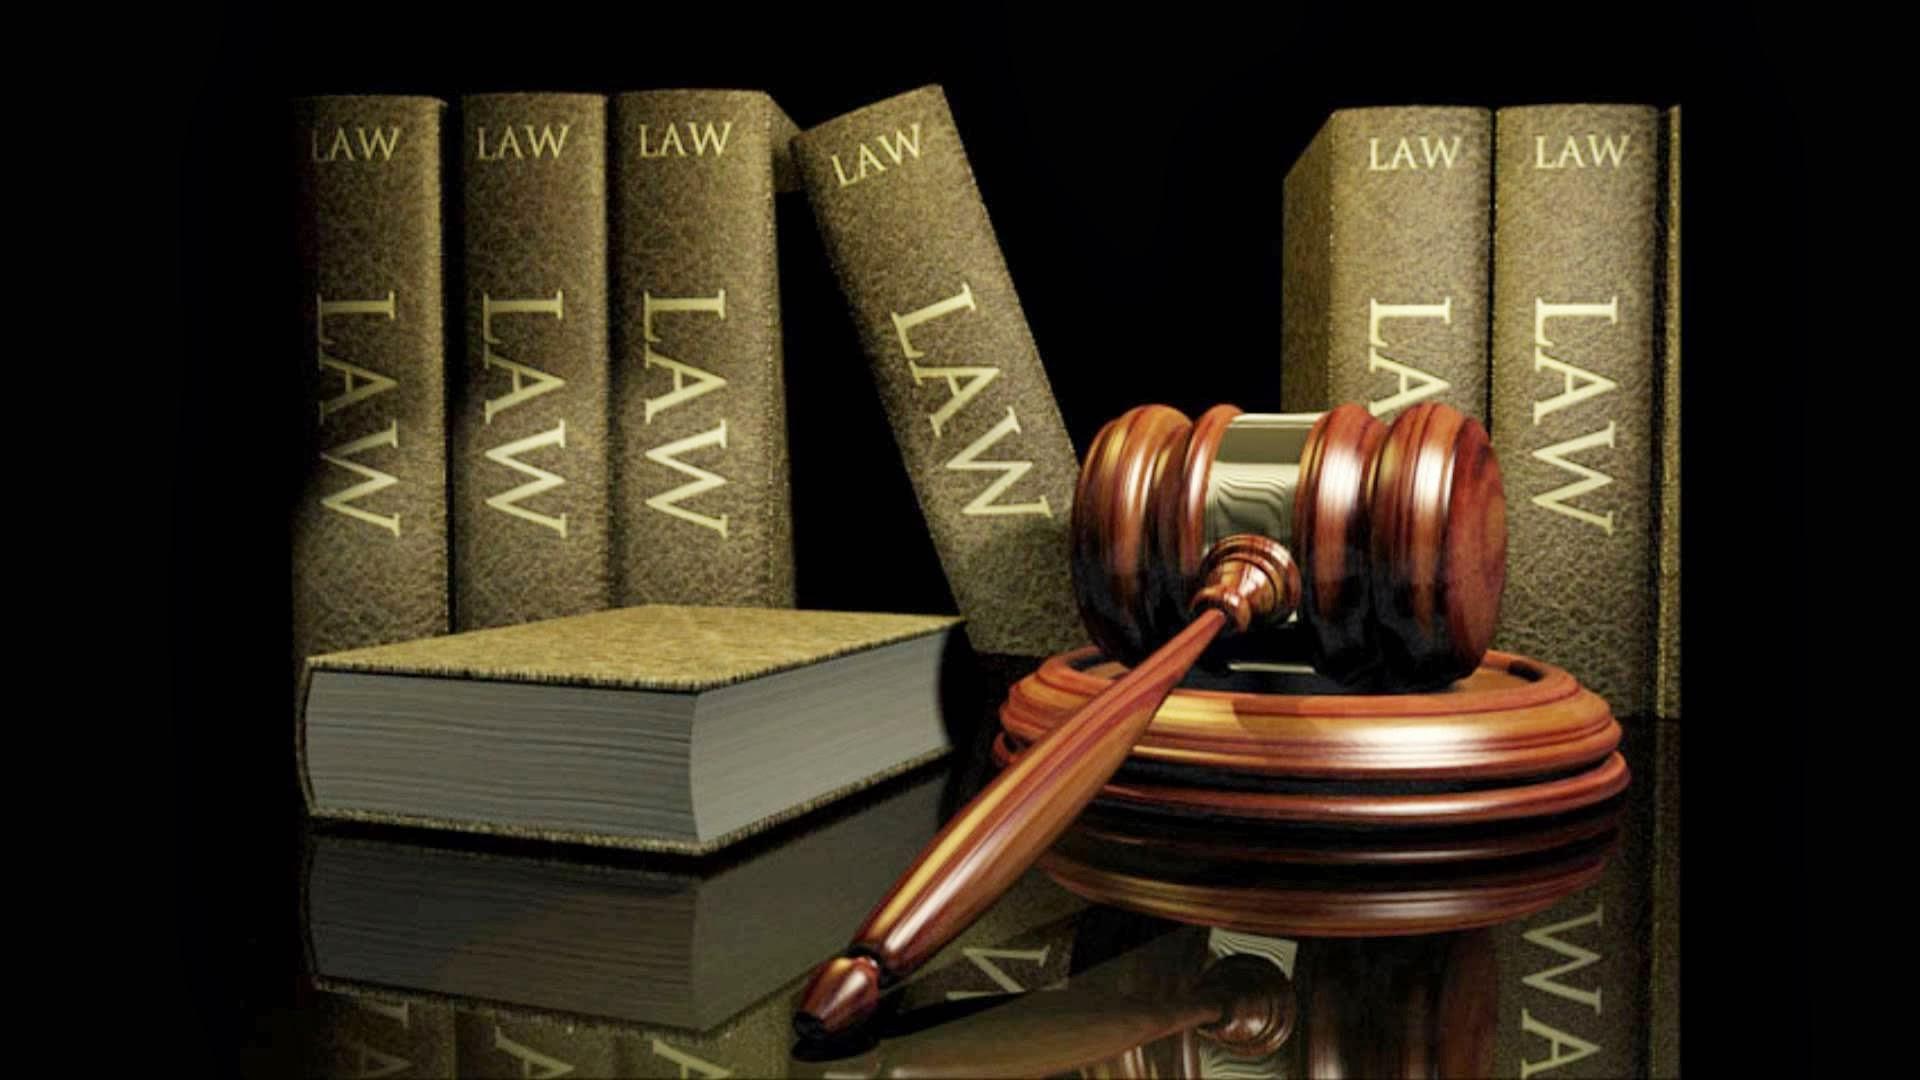 Best 56 Lawyer Wallpaper on HipWallpaper Lawyer Wallpaper 1920x1080